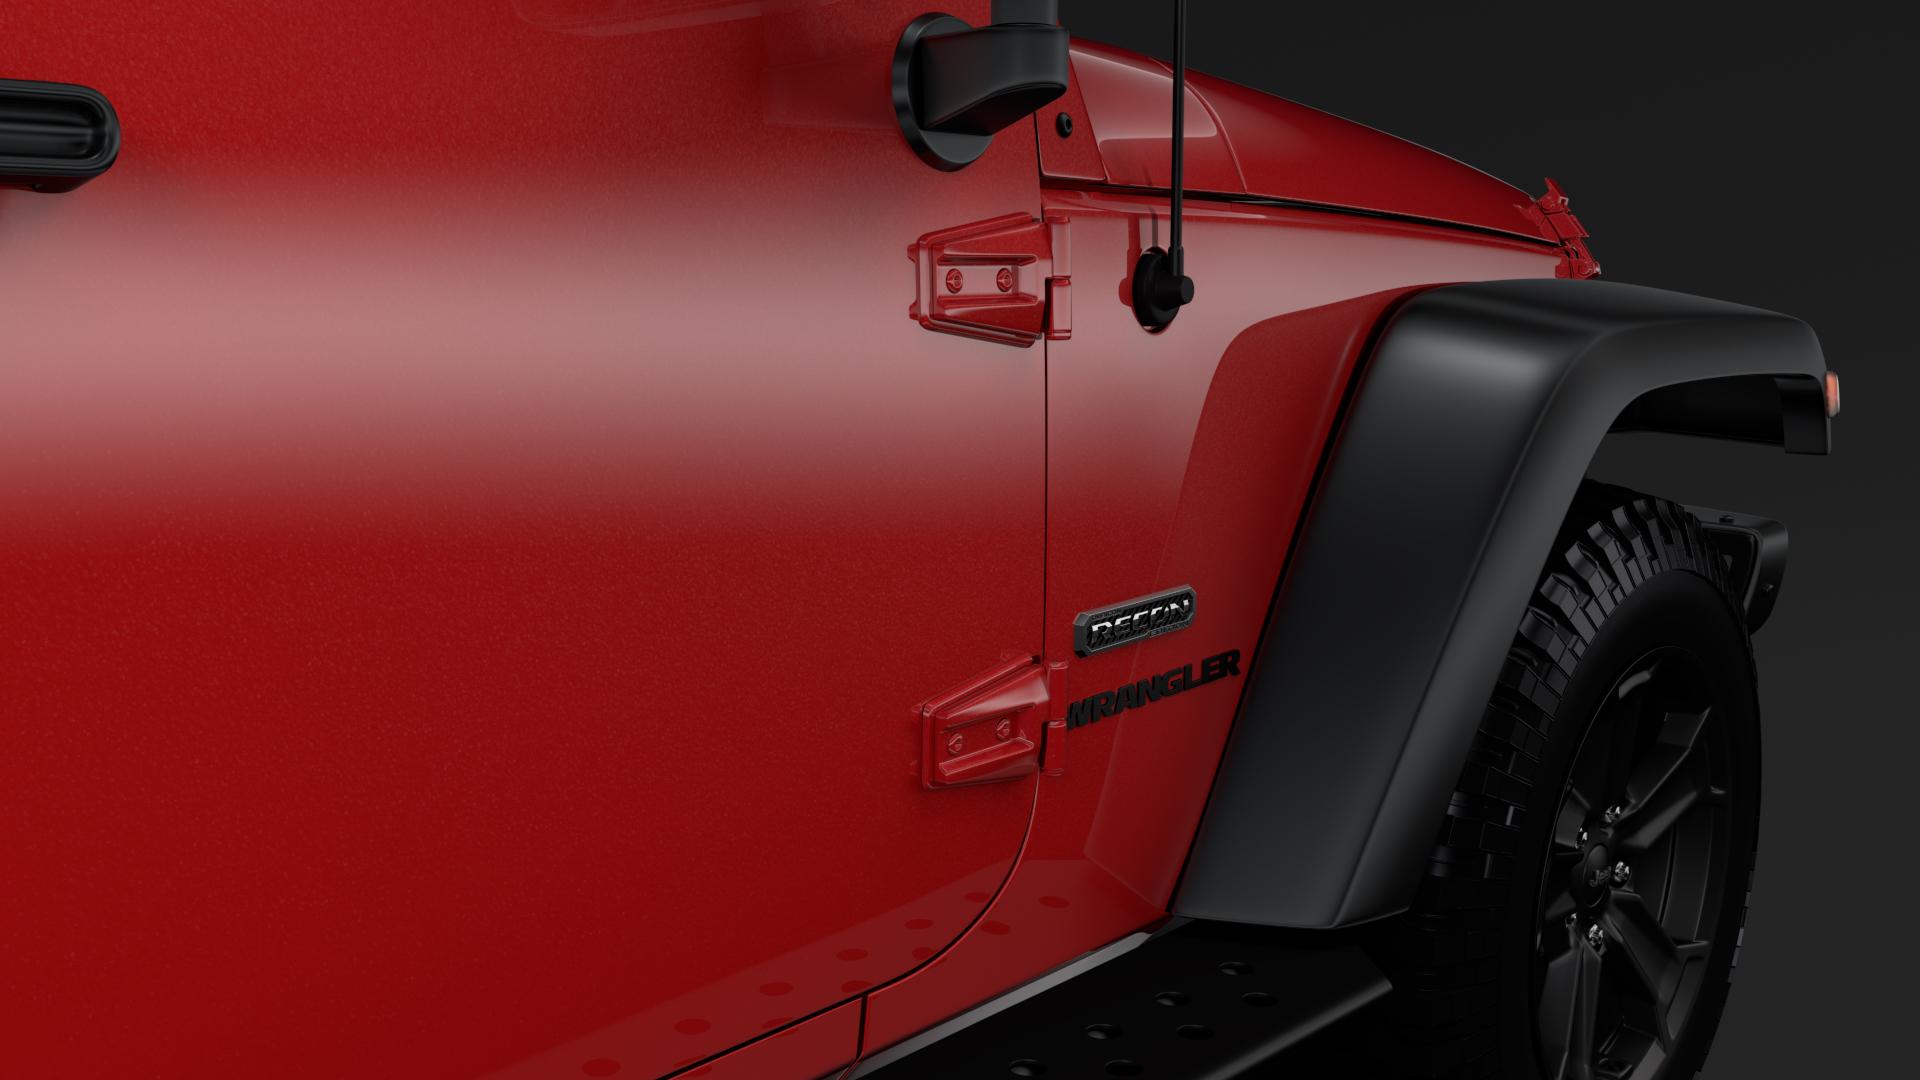 jeep wrangler 6×6 rubicon recon jk 2017 3d model max fbx c4d lwo ma mb hrc xsi obj 276840